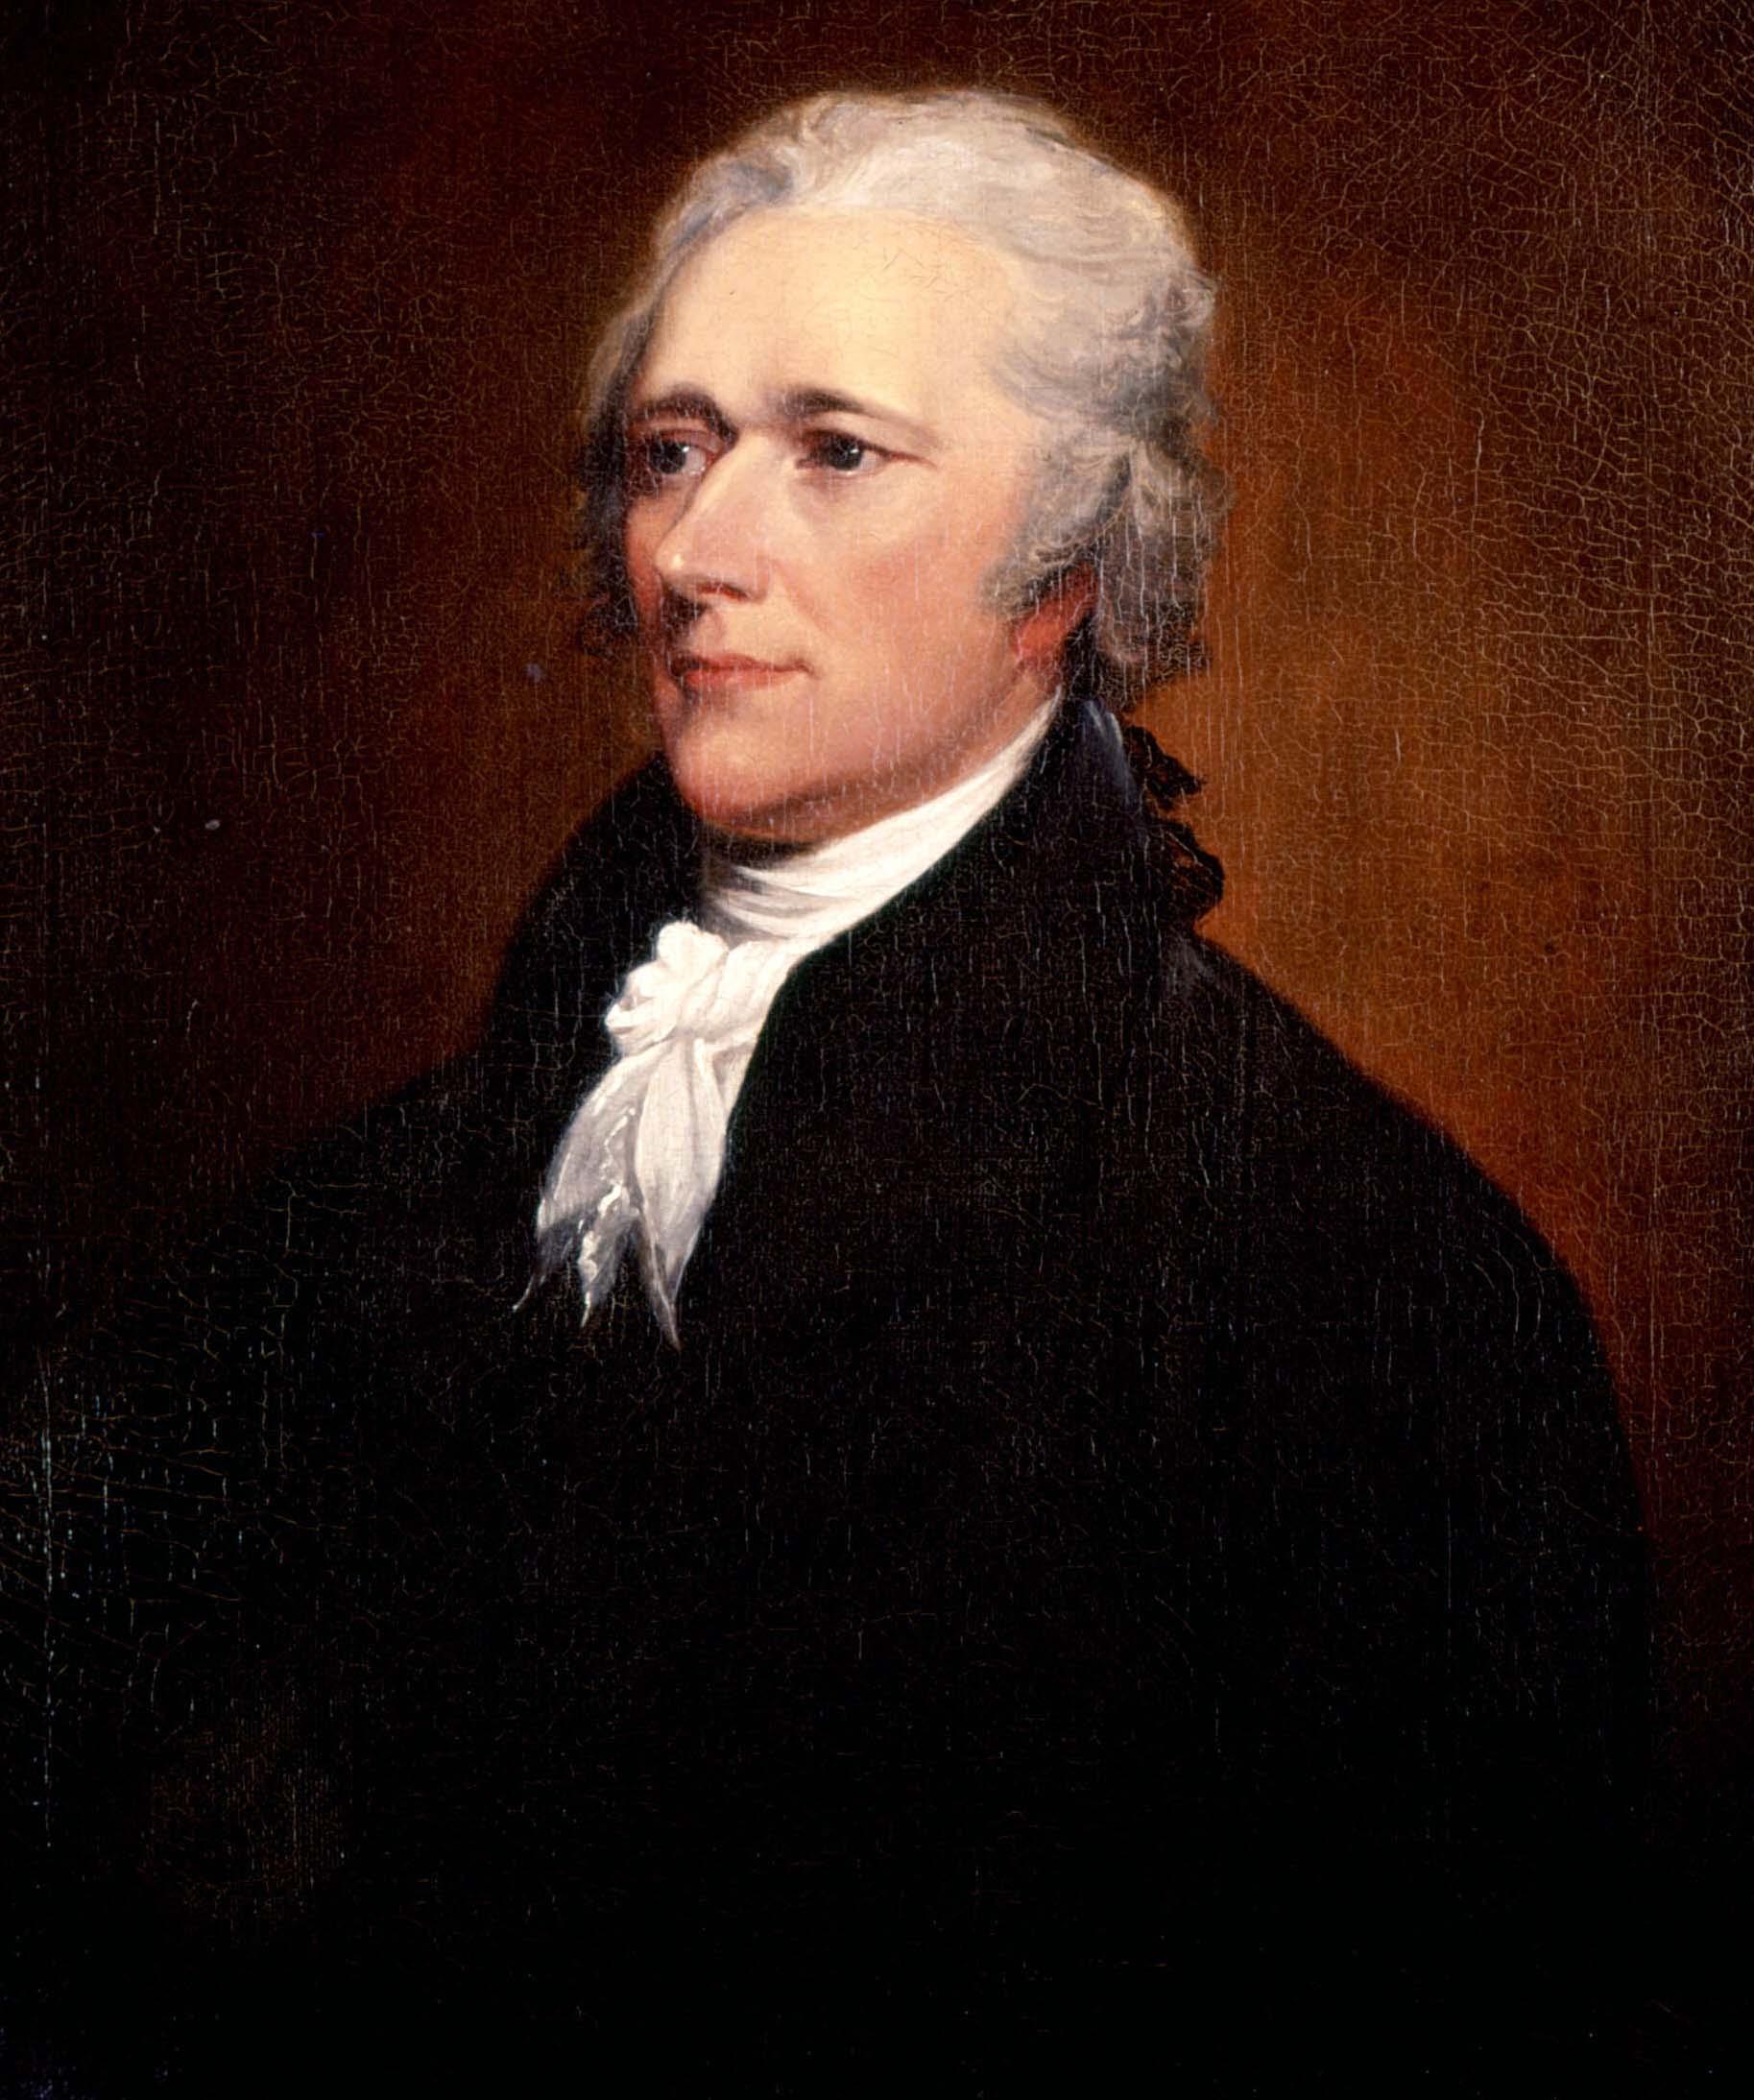 File:Alexander Hamilton, by Trumbull.jpg - Wikimedia Commons